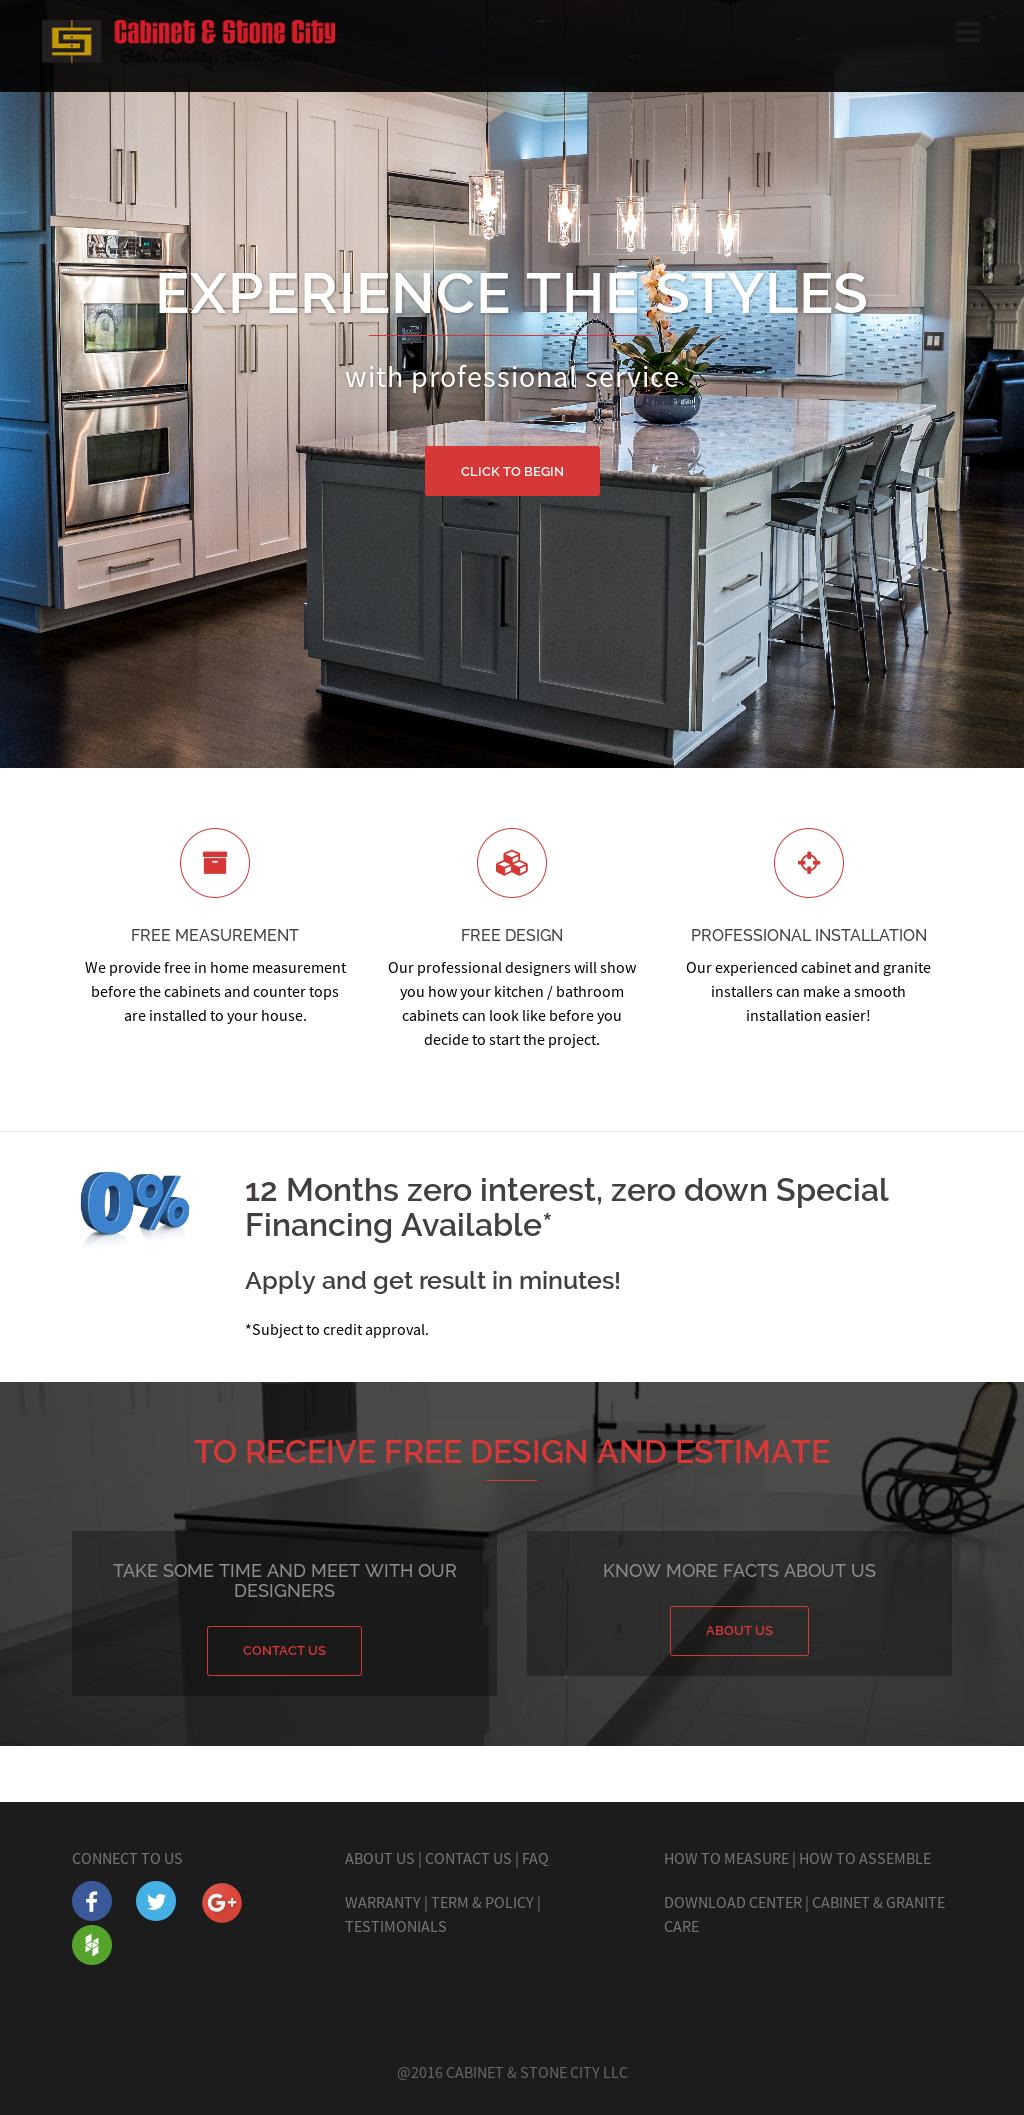 Tremendous Cabinet Stone City Kitchen Cabinets Direct Competitors Beutiful Home Inspiration Truamahrainfo